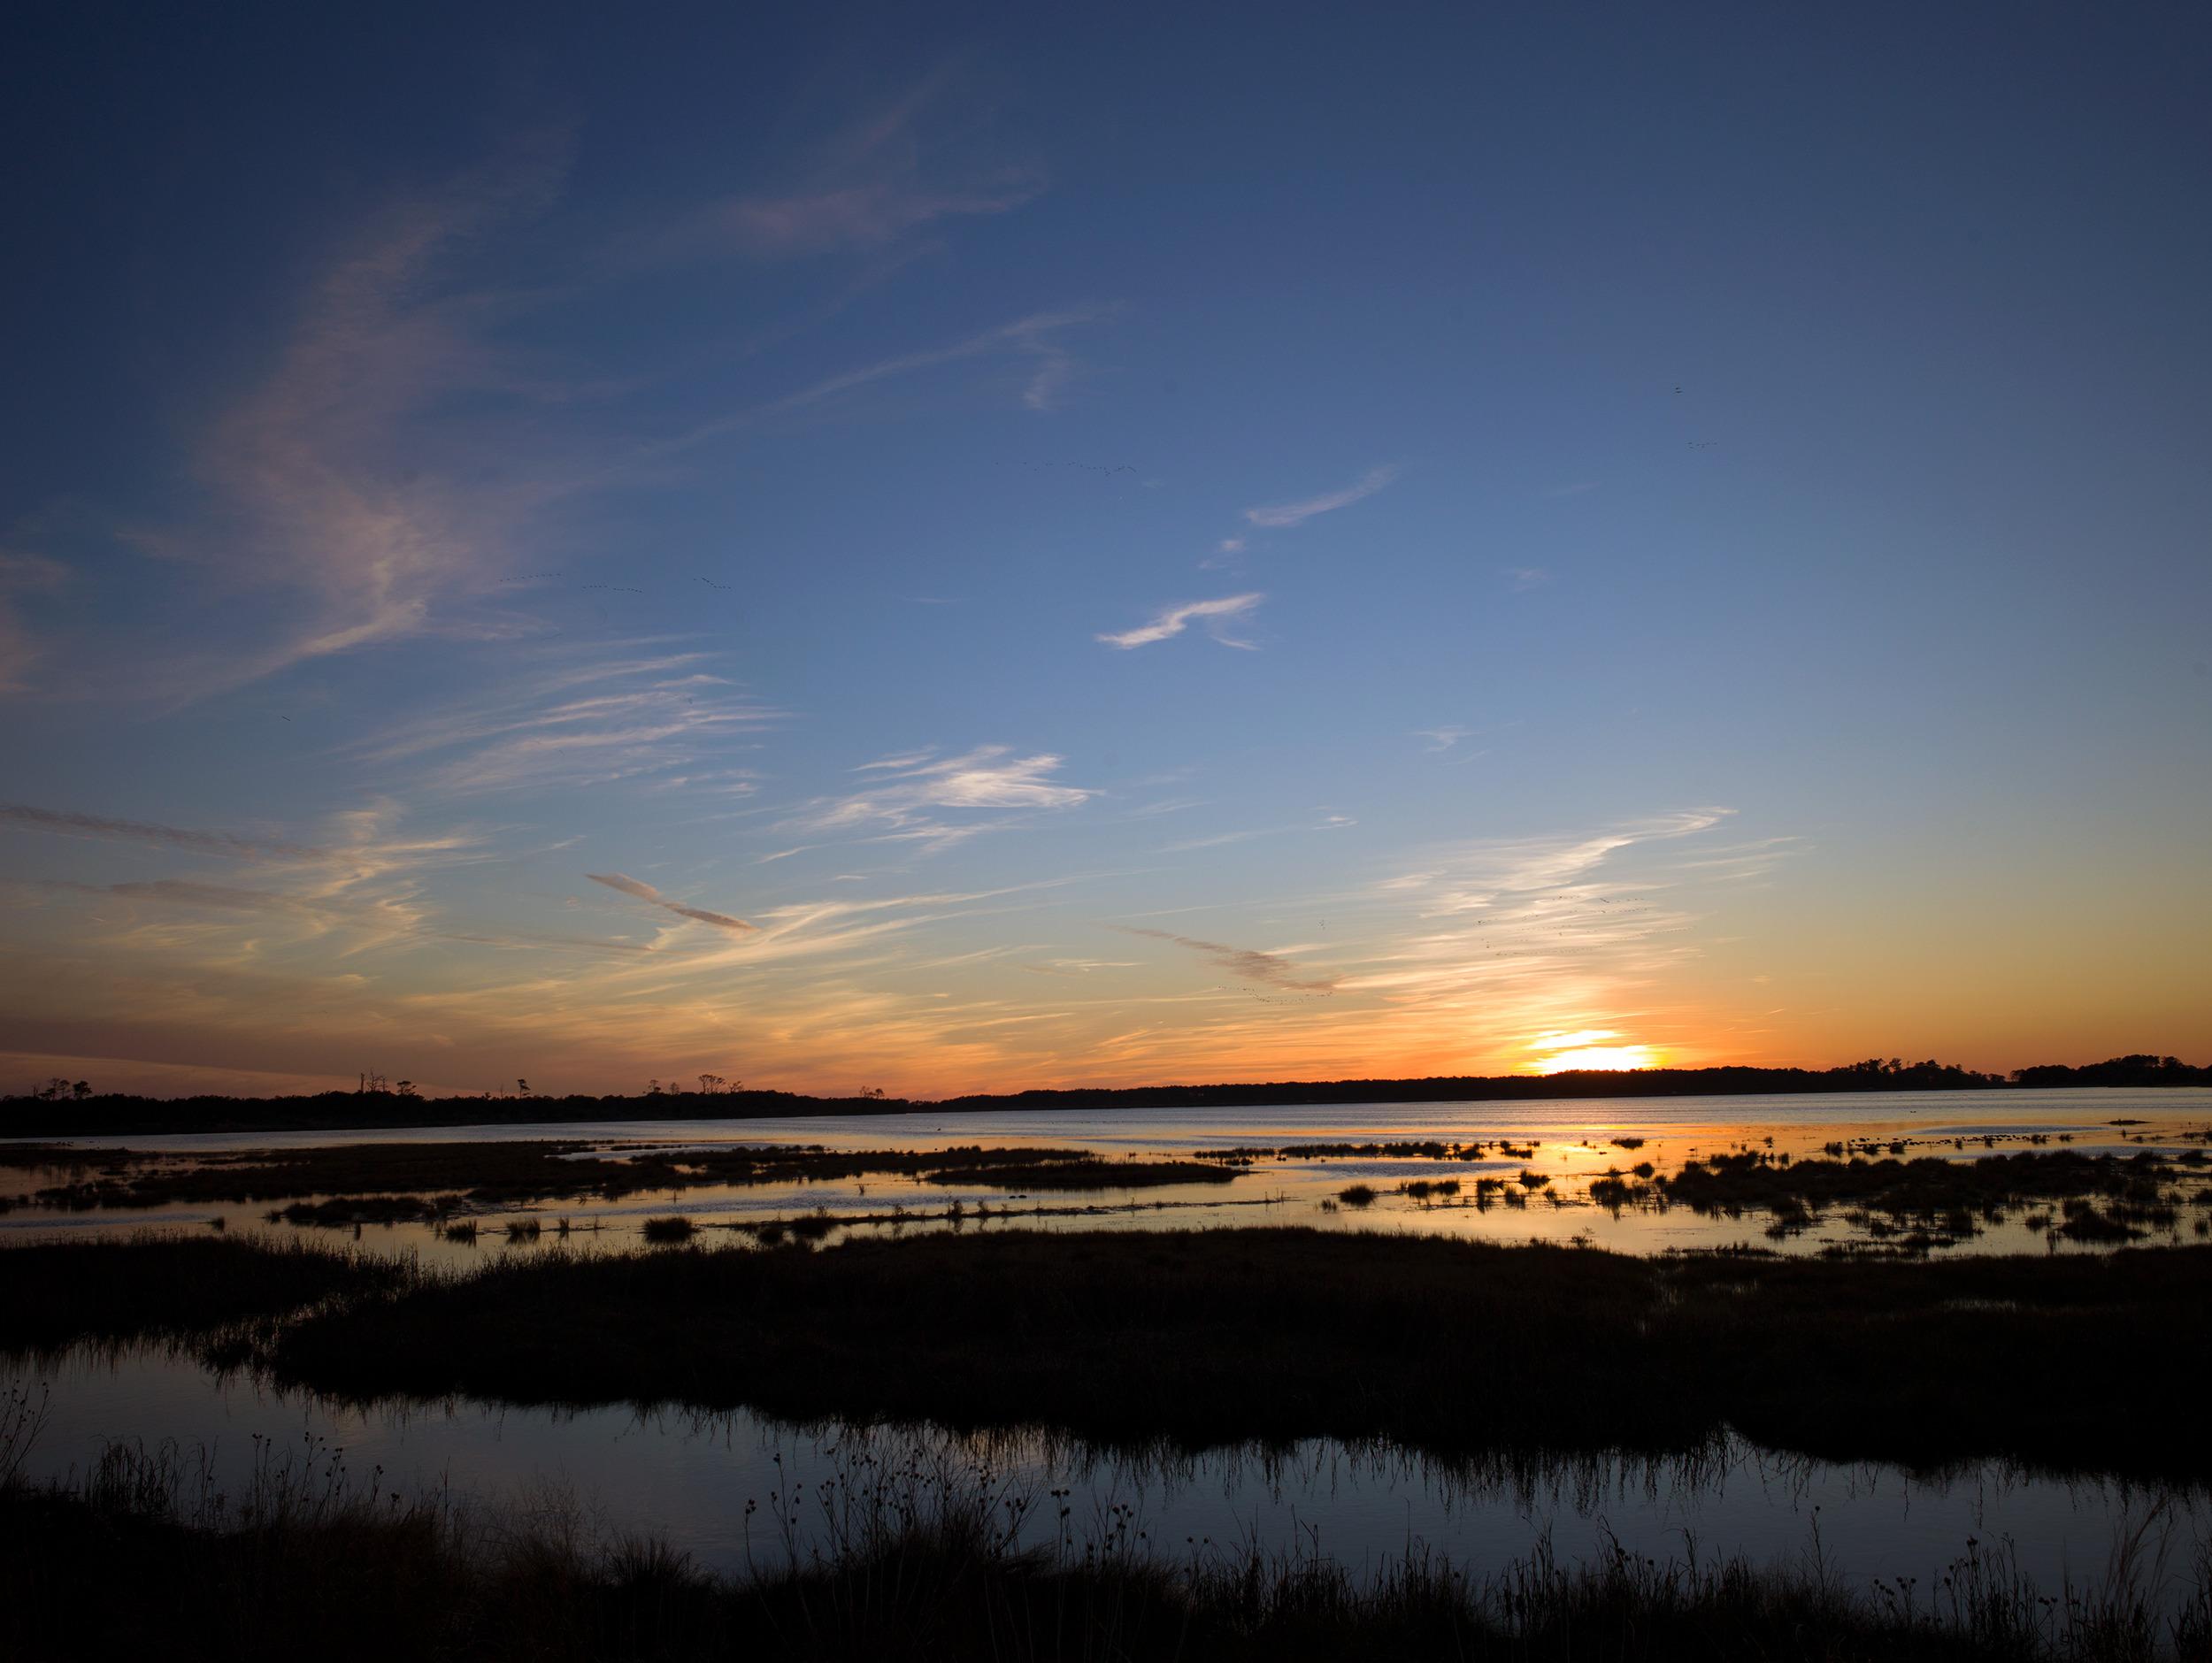 Sunset, Snow Goose Pond, Virginia District (2015)